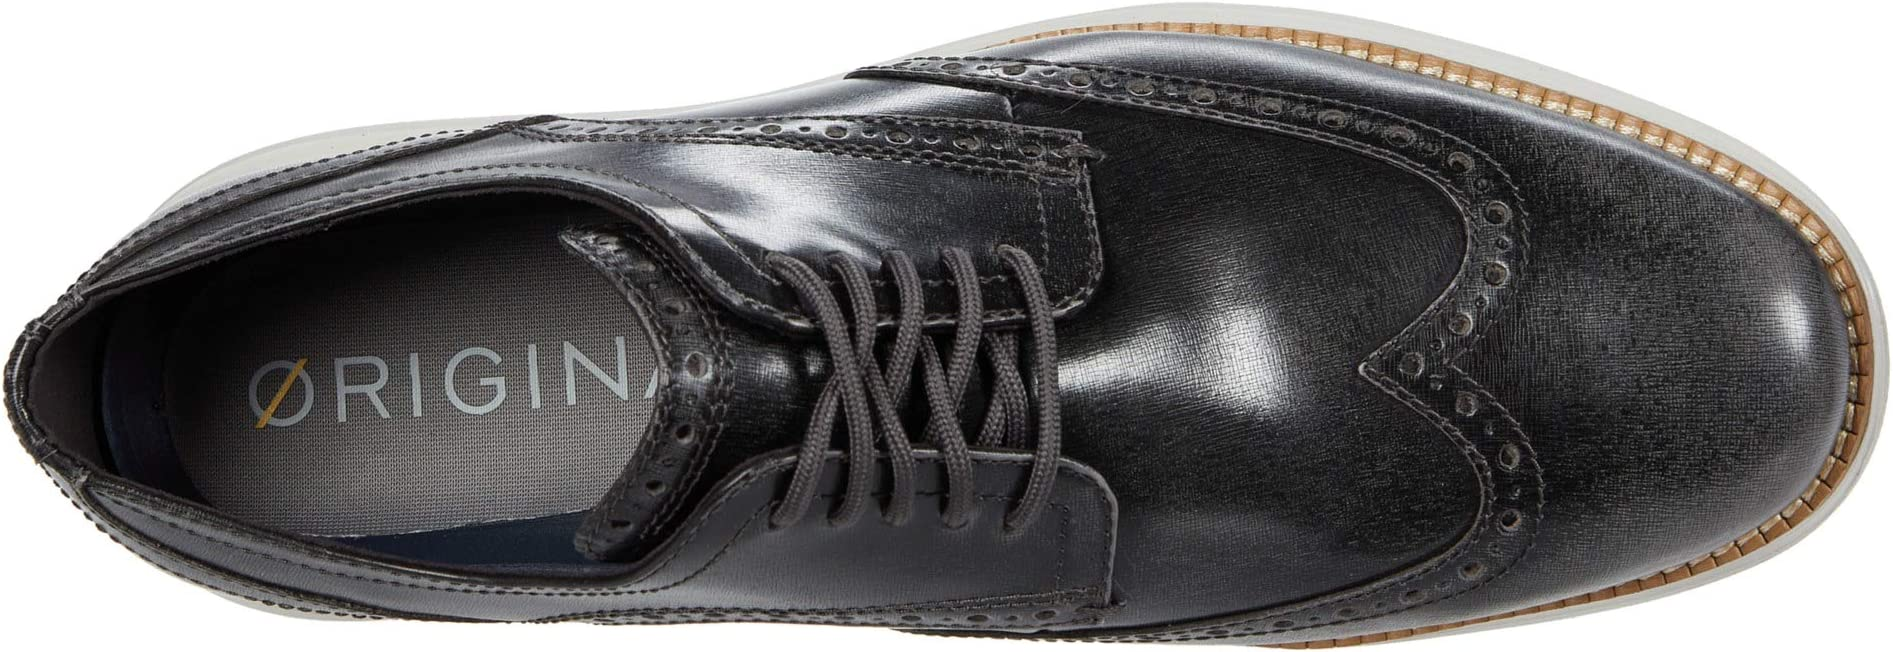 Cole Haan Original Grand Wingtip Oxford | Men's shoes | 2020 Newest